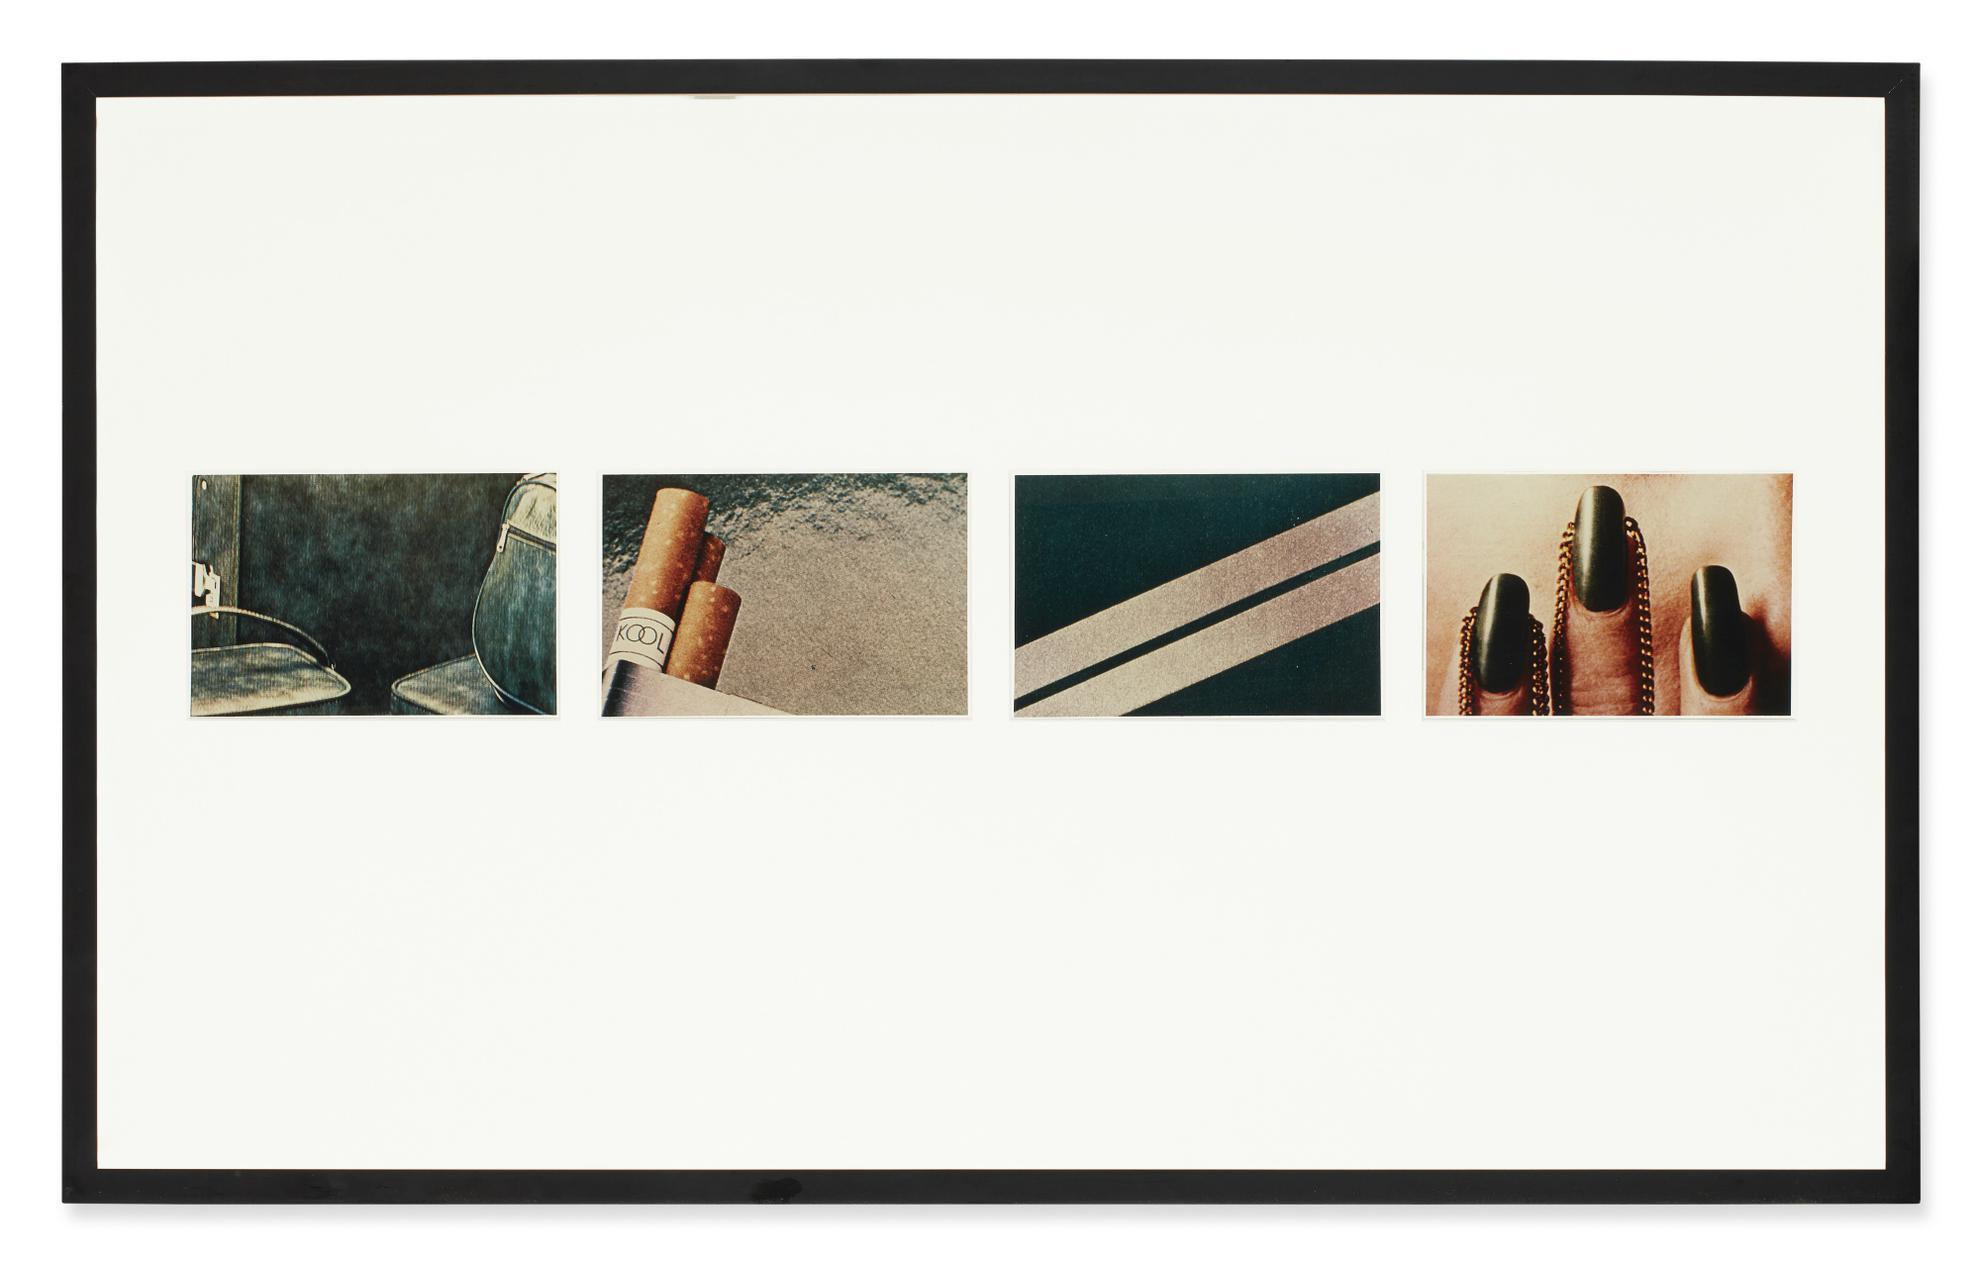 Richard Prince-Green (Luggage, Cigarettes, Graphite, Jewelry)-1977